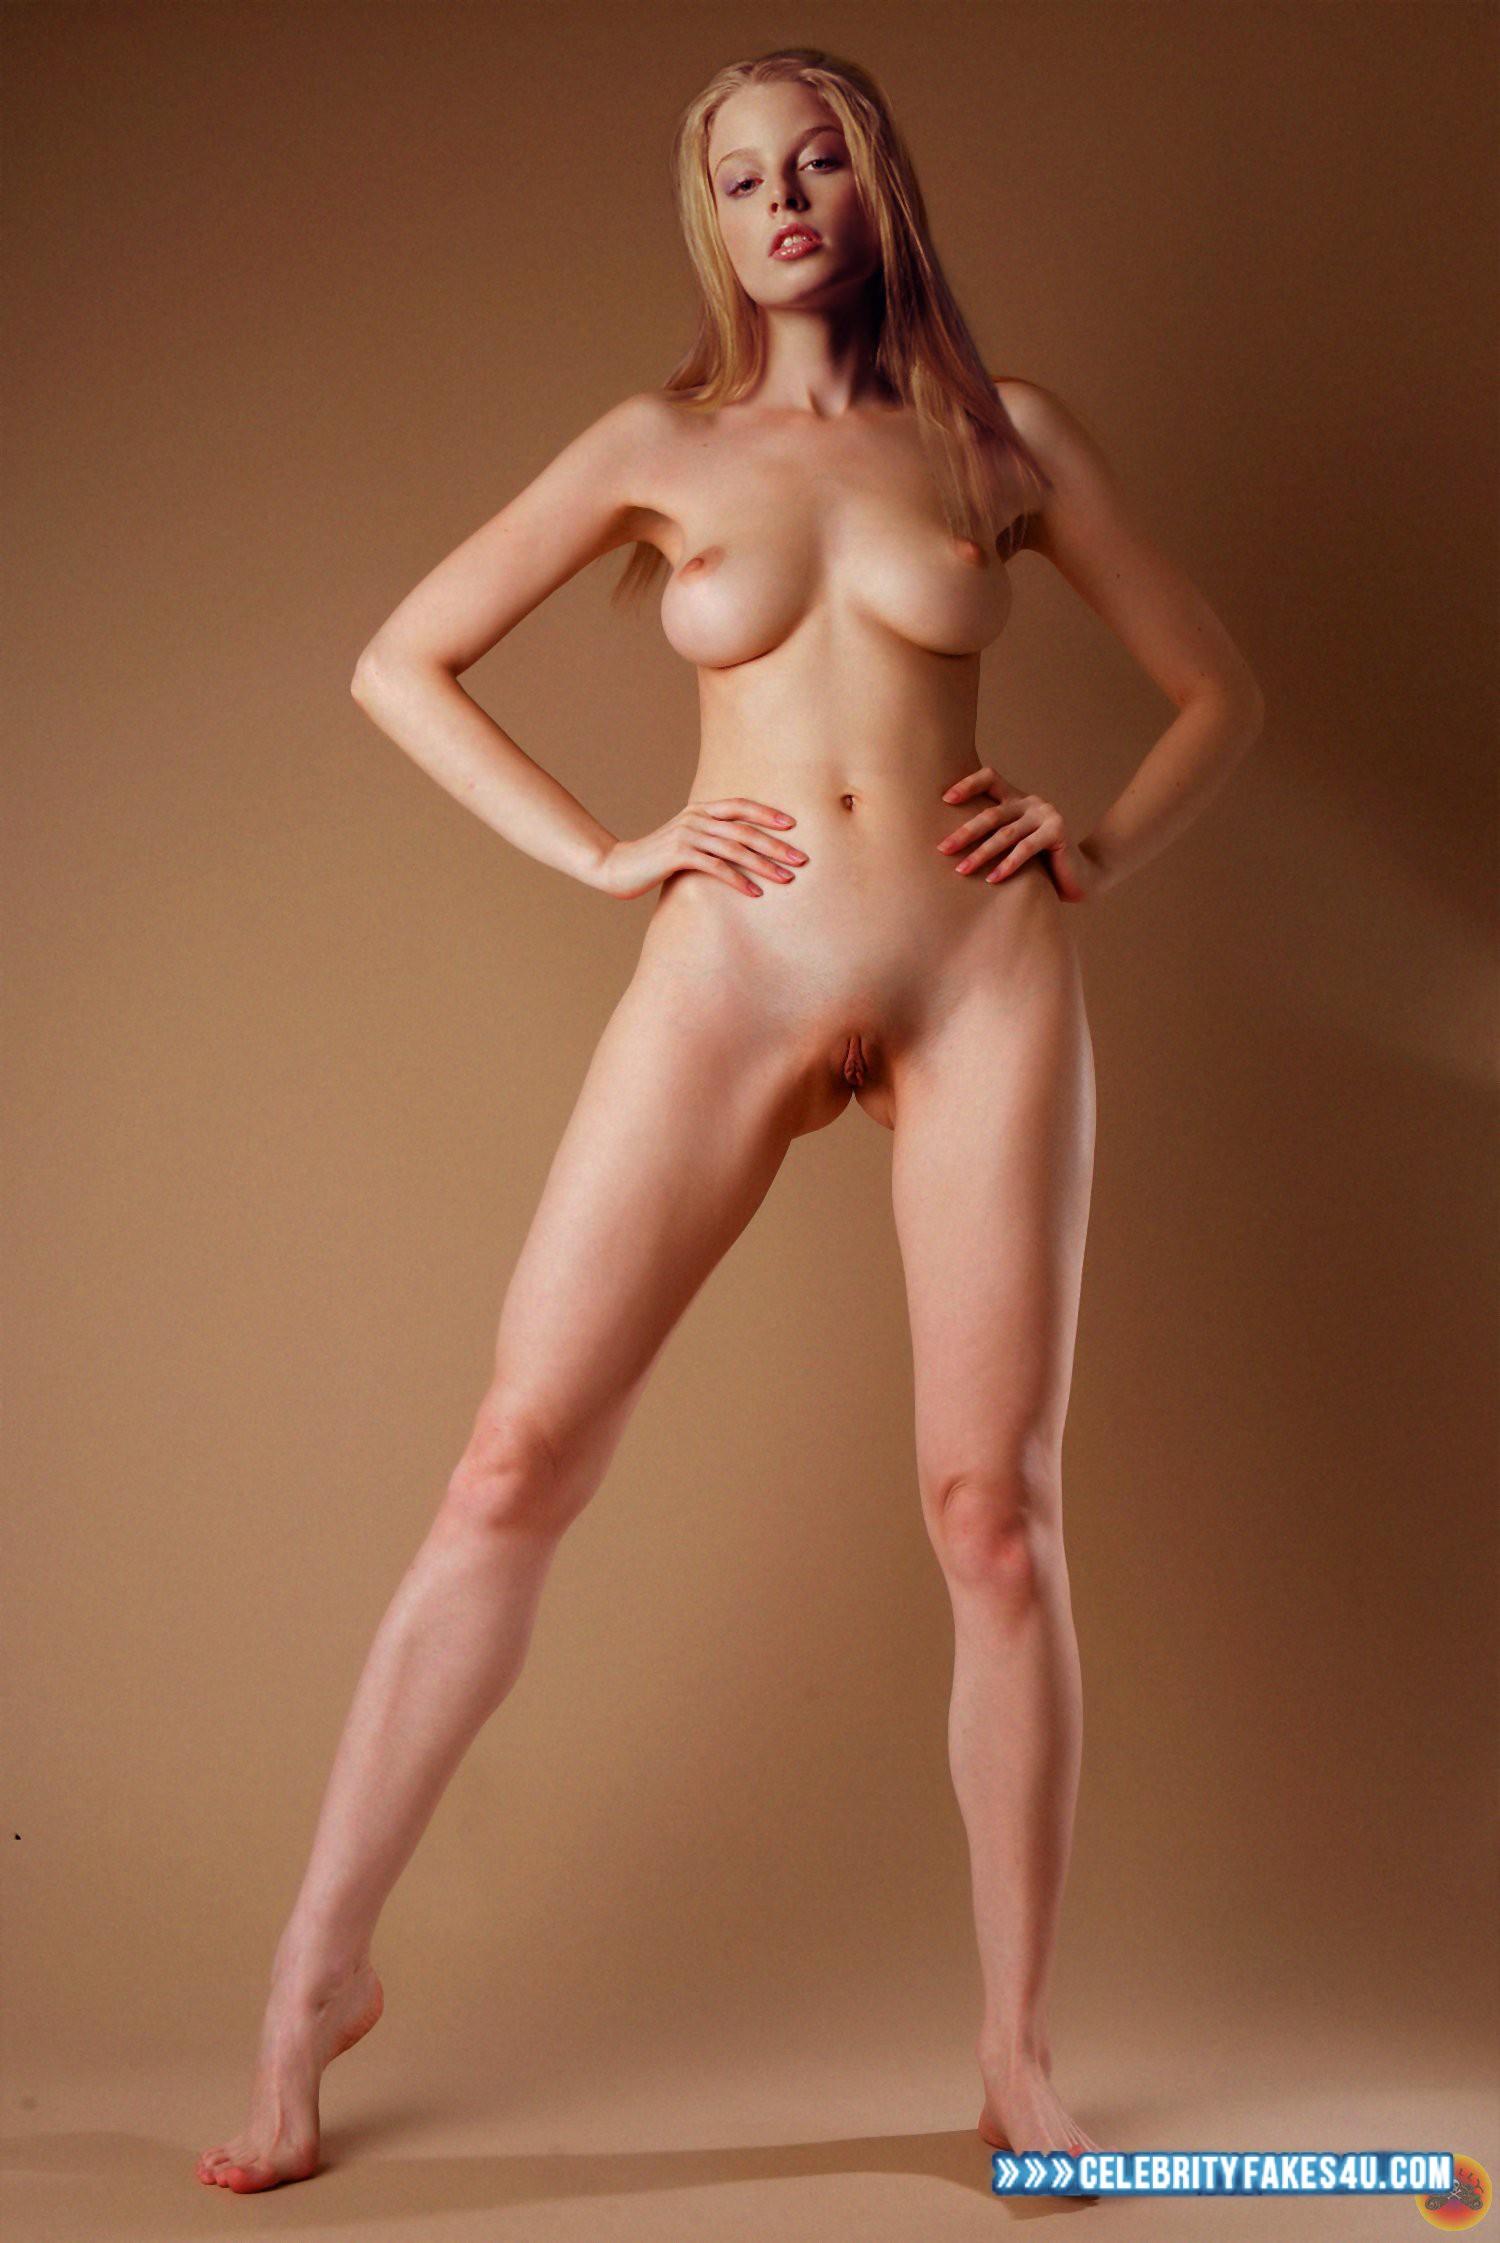 Rachel nichols espn nude pics